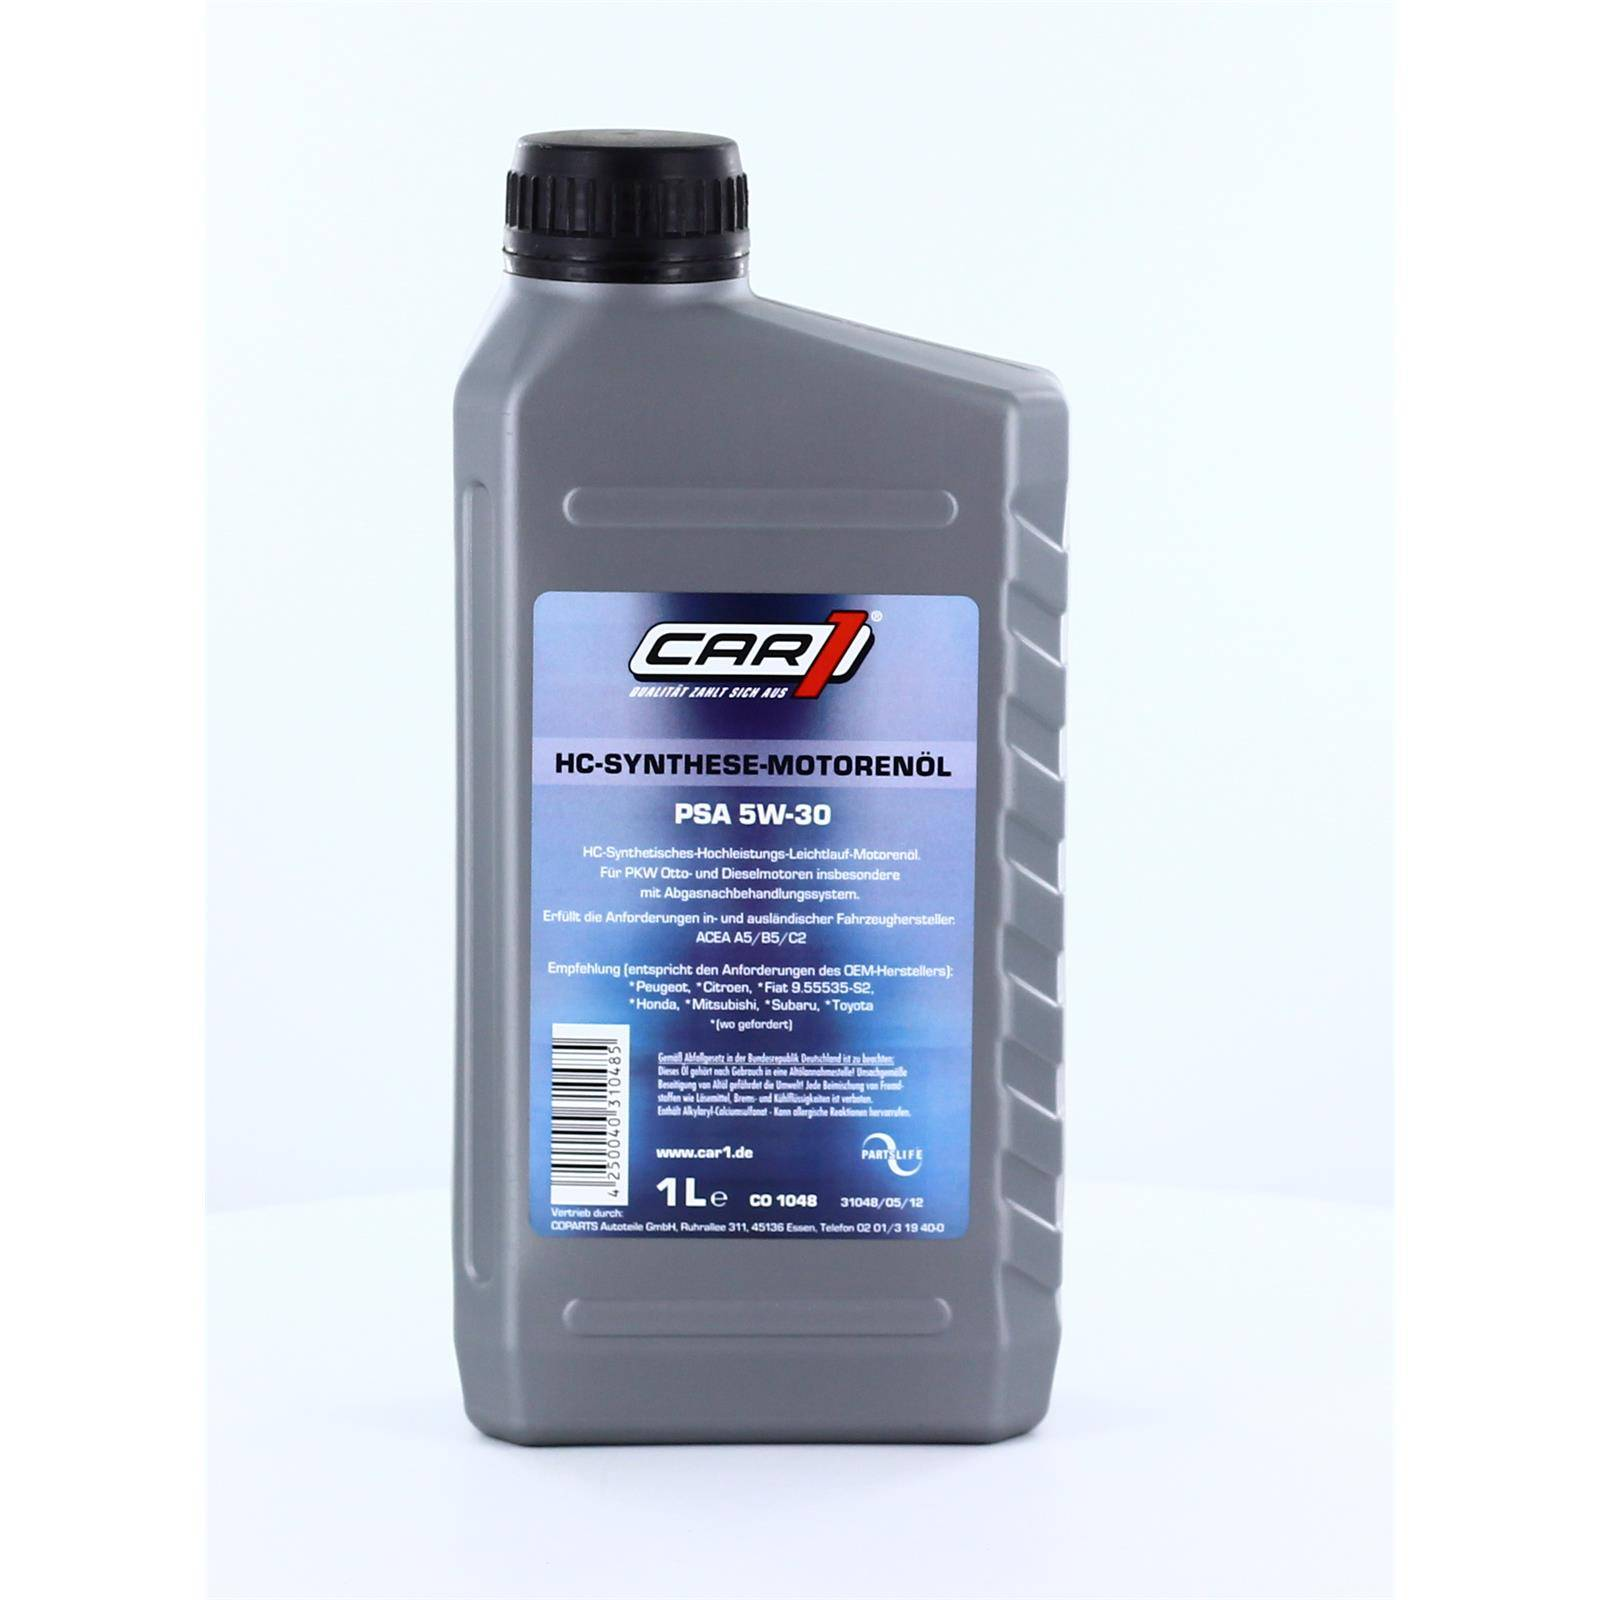 1l Car1 Motoröl, 5w30 Psa Co 1048 Motoröl Leichtlaufmotorenöl Co 1048